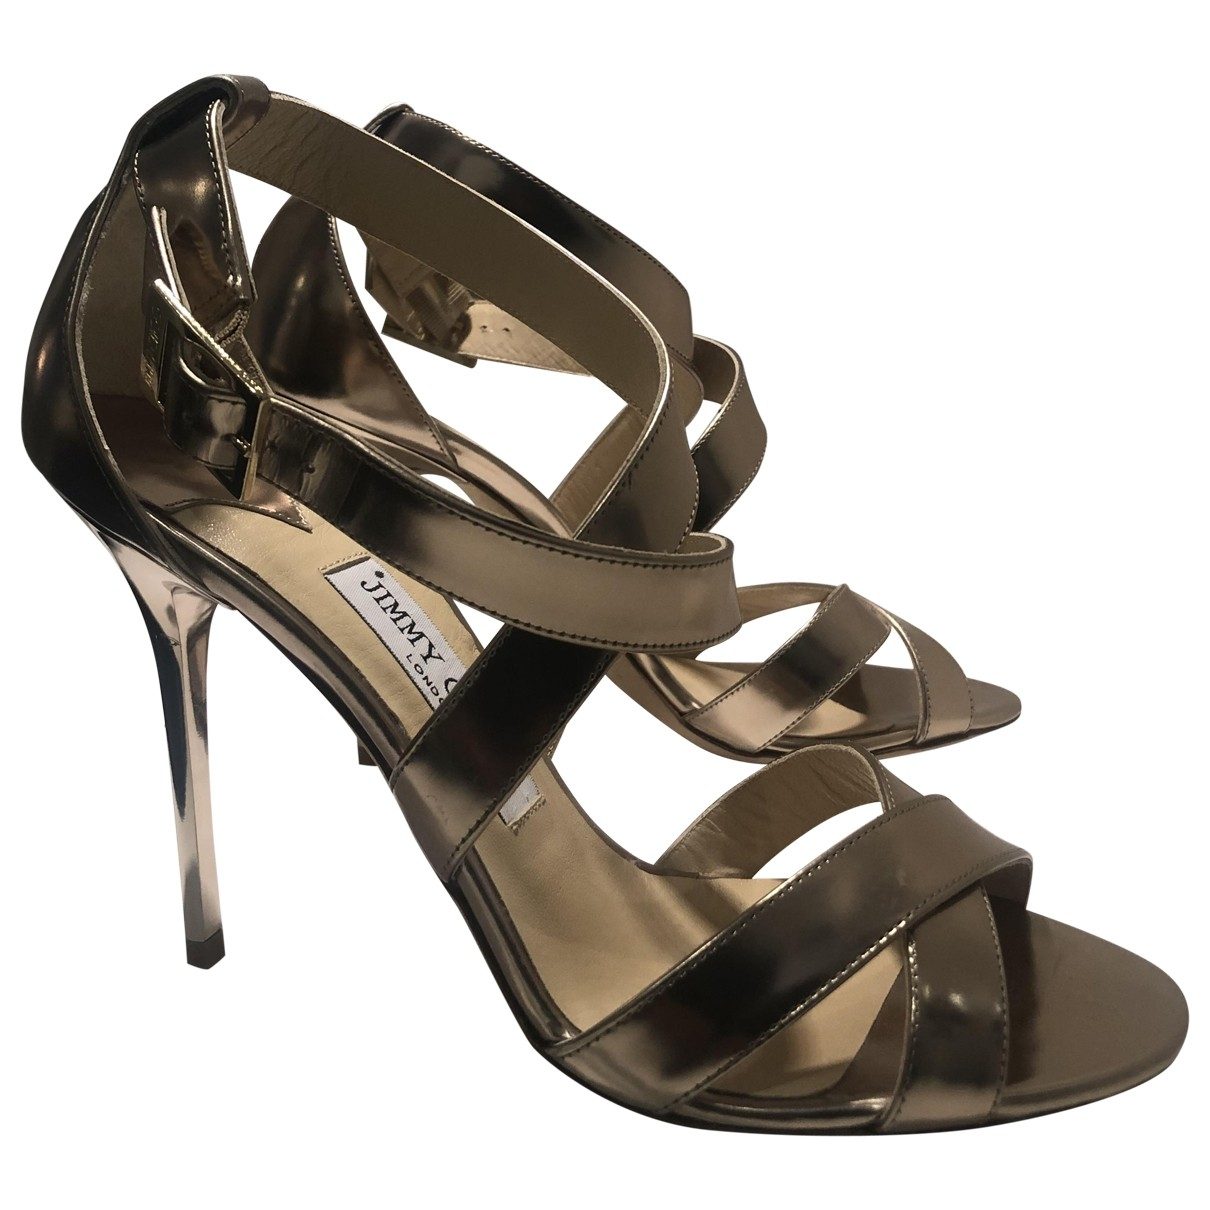 Jimmy Choo \N Gold Leather Sandals for Women 39.5 EU